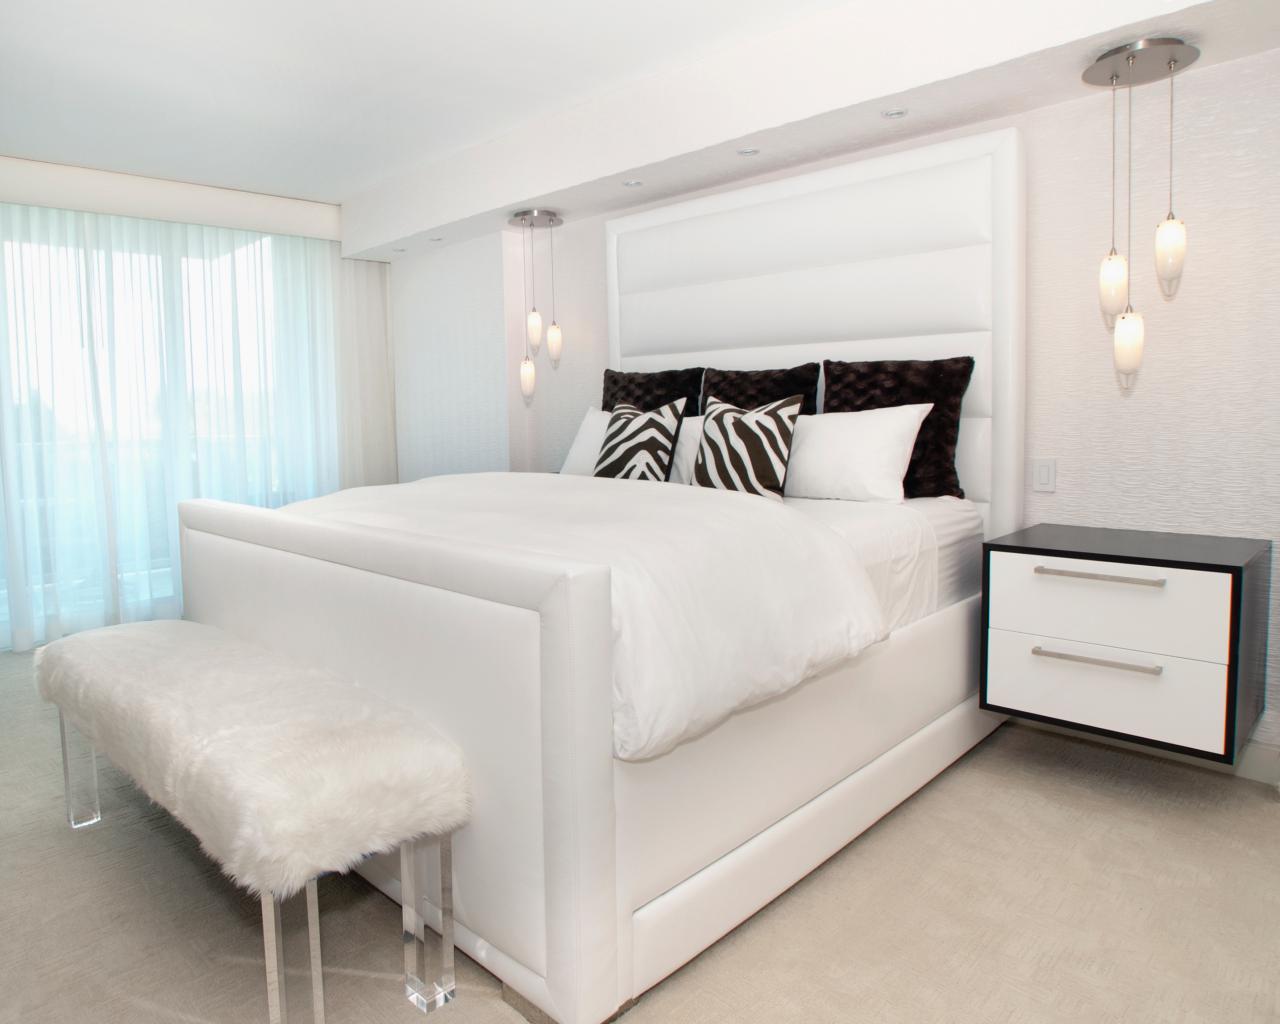 Merveilleux Alena Capra_All White Bedroom Bed